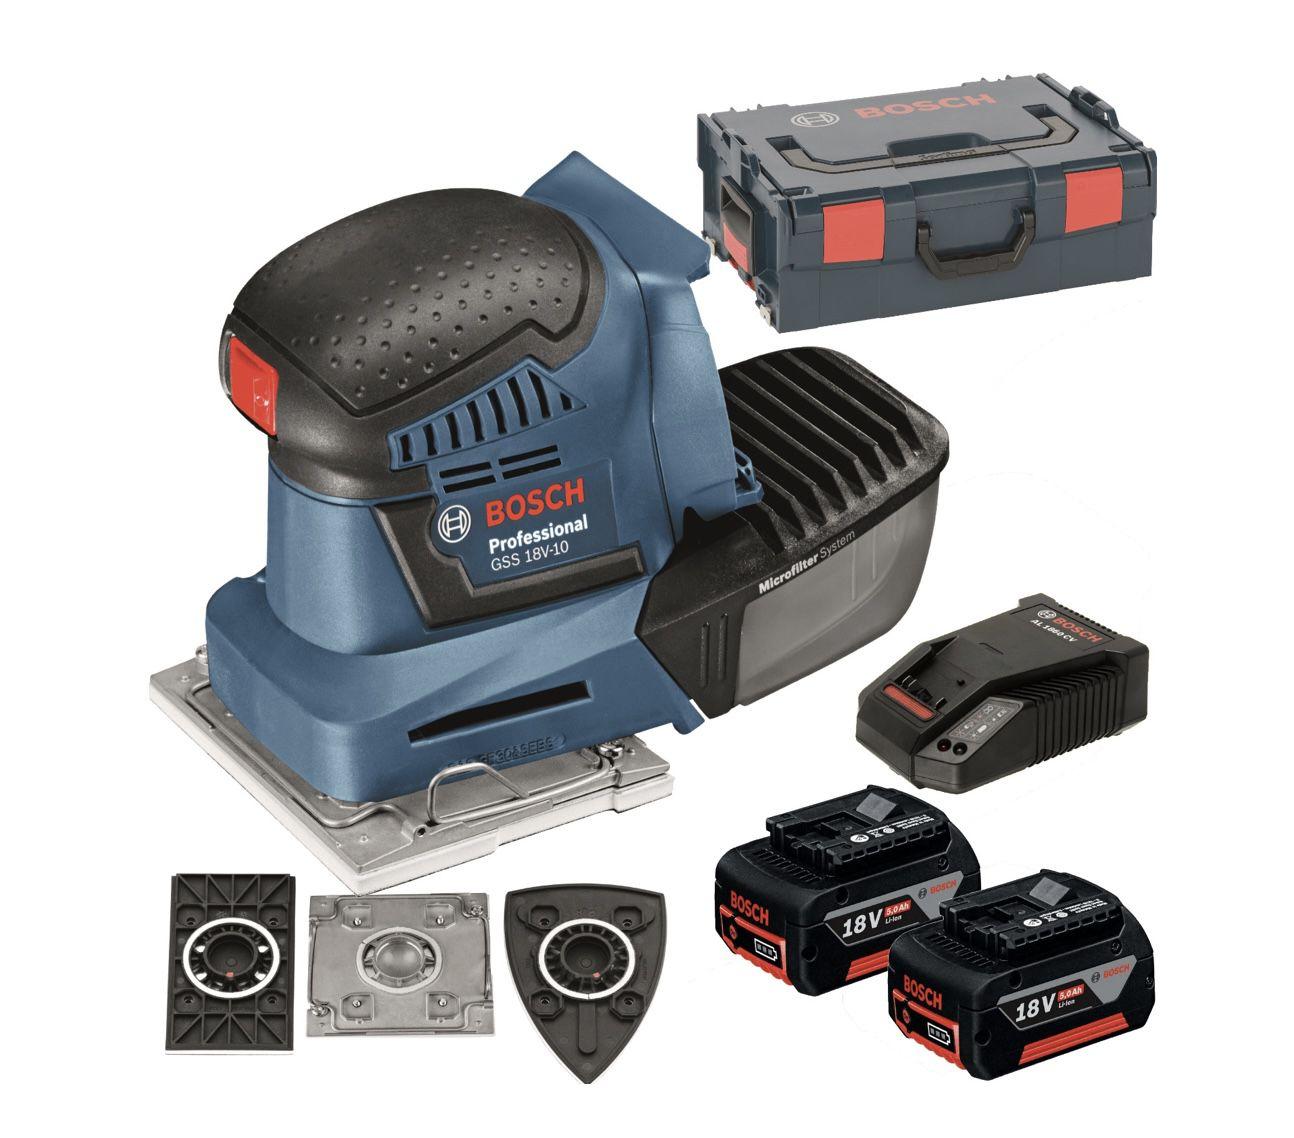 Bosch Akku-Schwingschleifer GSS 18V-10 Professional inkl. L-BOXX & 2x Li-Ionen Akku (5,0Ah) für 239€ (statt 265€)